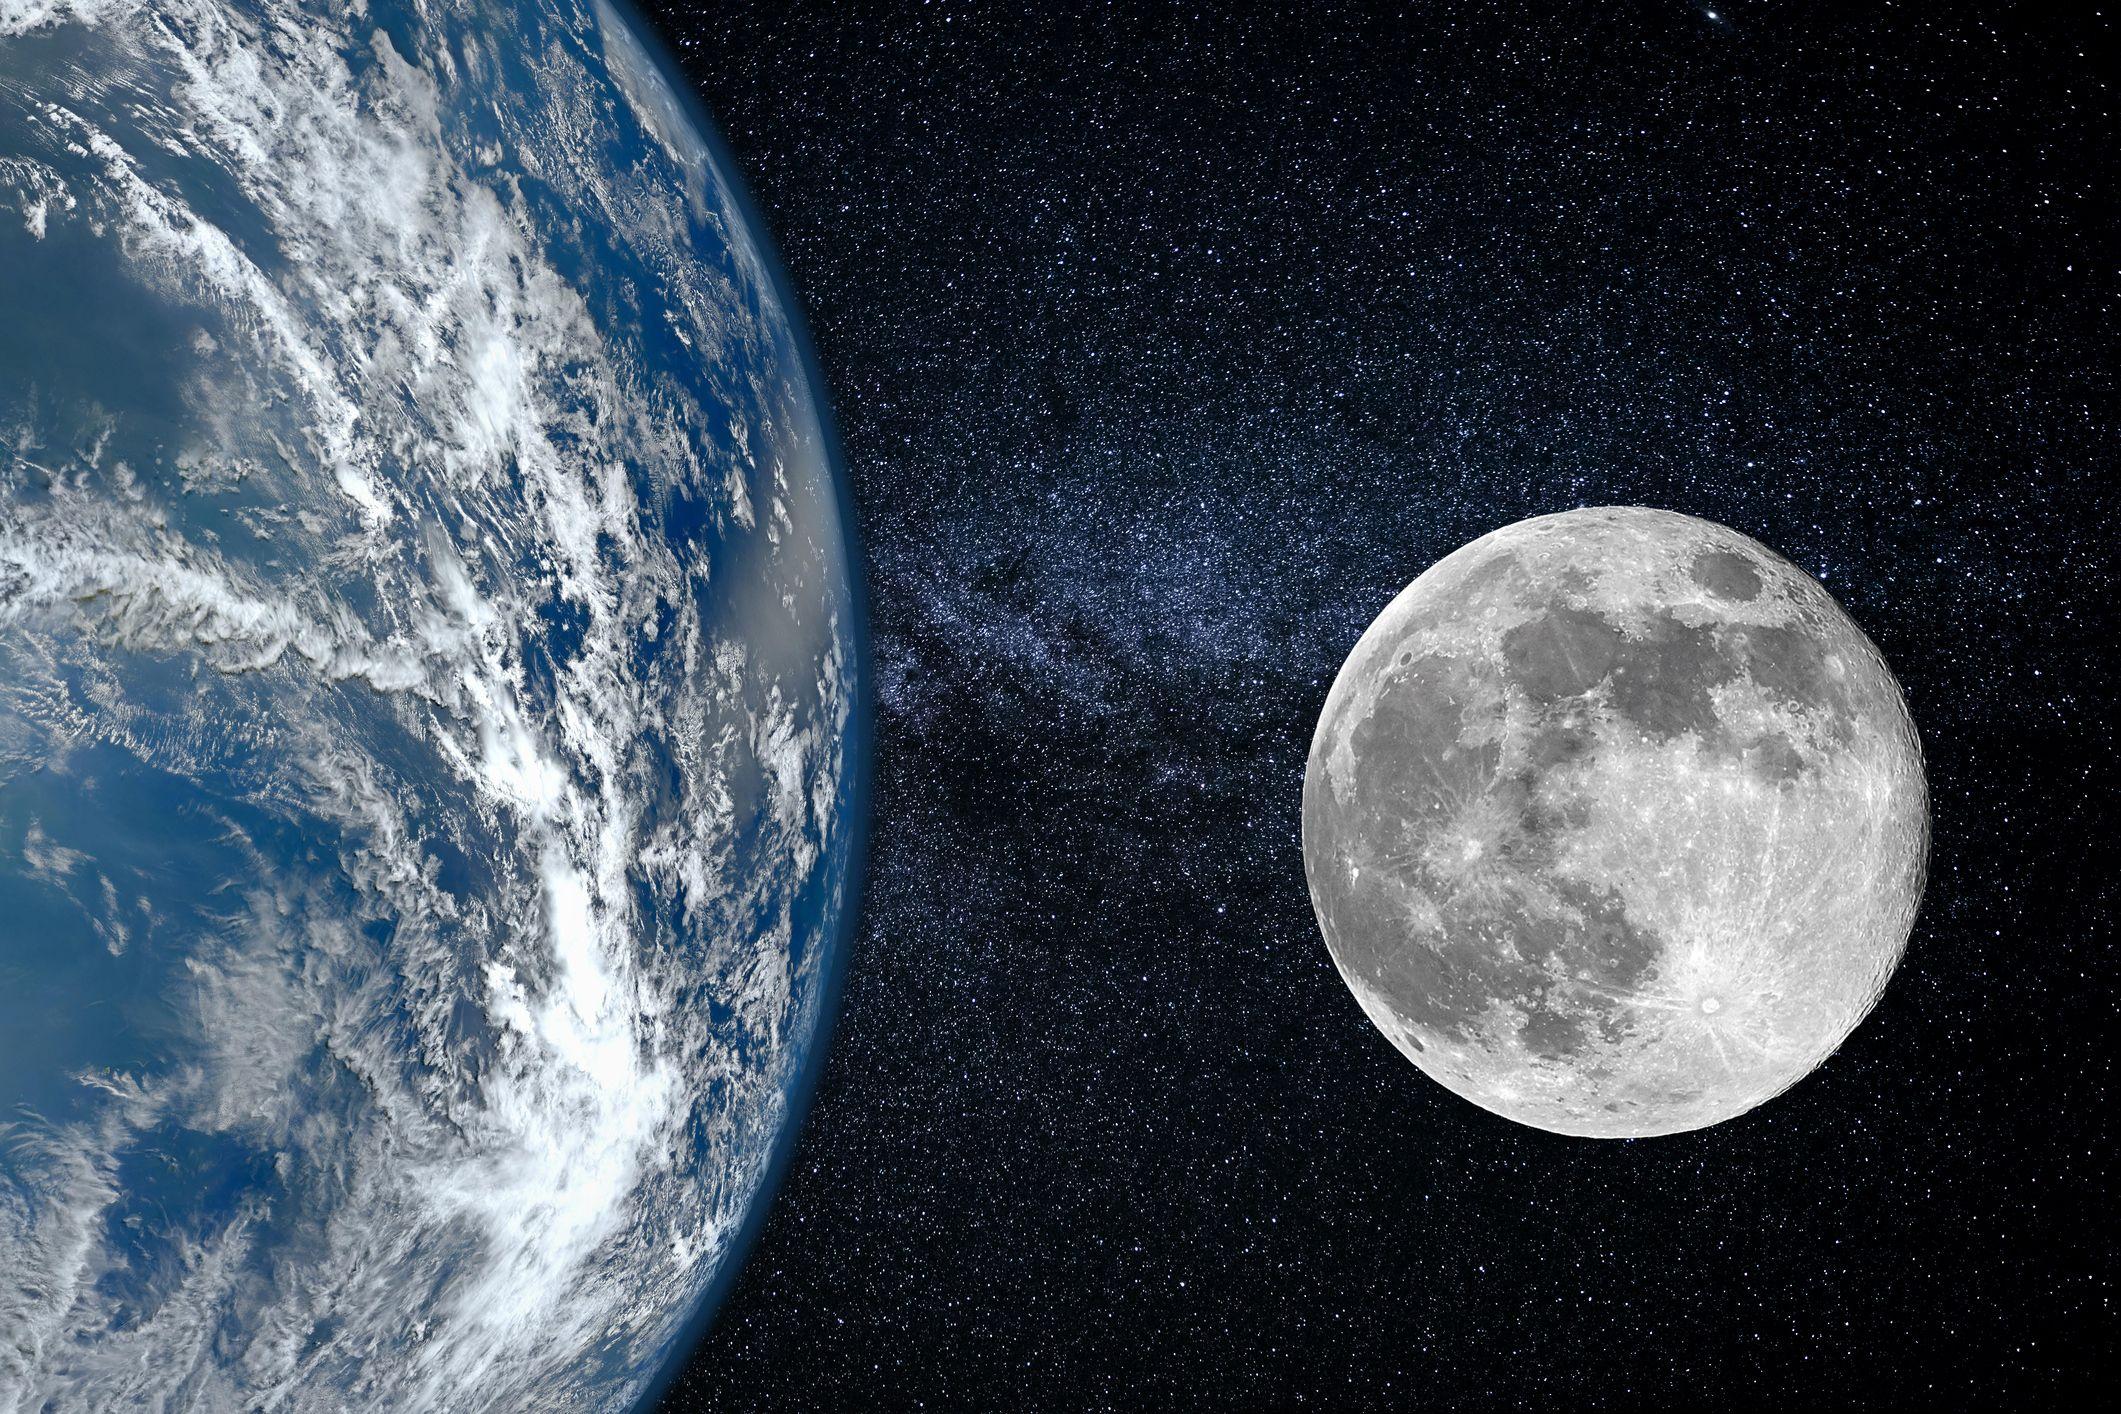 10_19_Earth and Moon